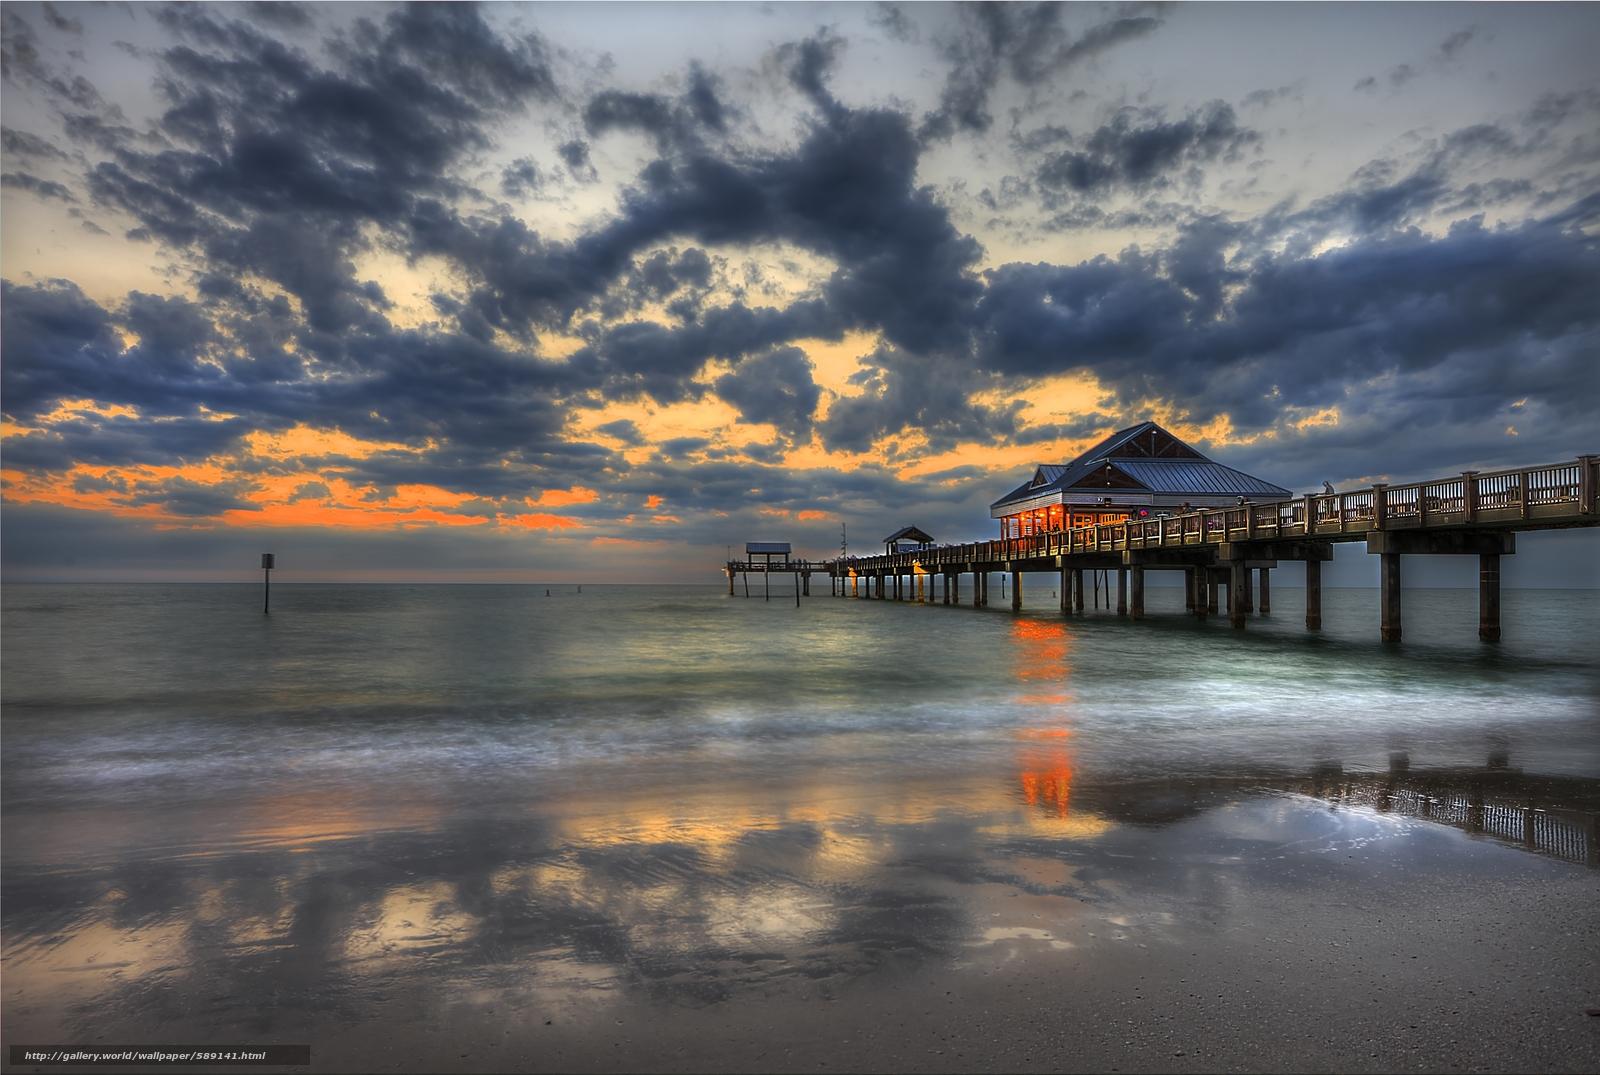 Wallpaper Clearwater Fl: Download Wallpaper Sunset, Pier Clearwater, Florida